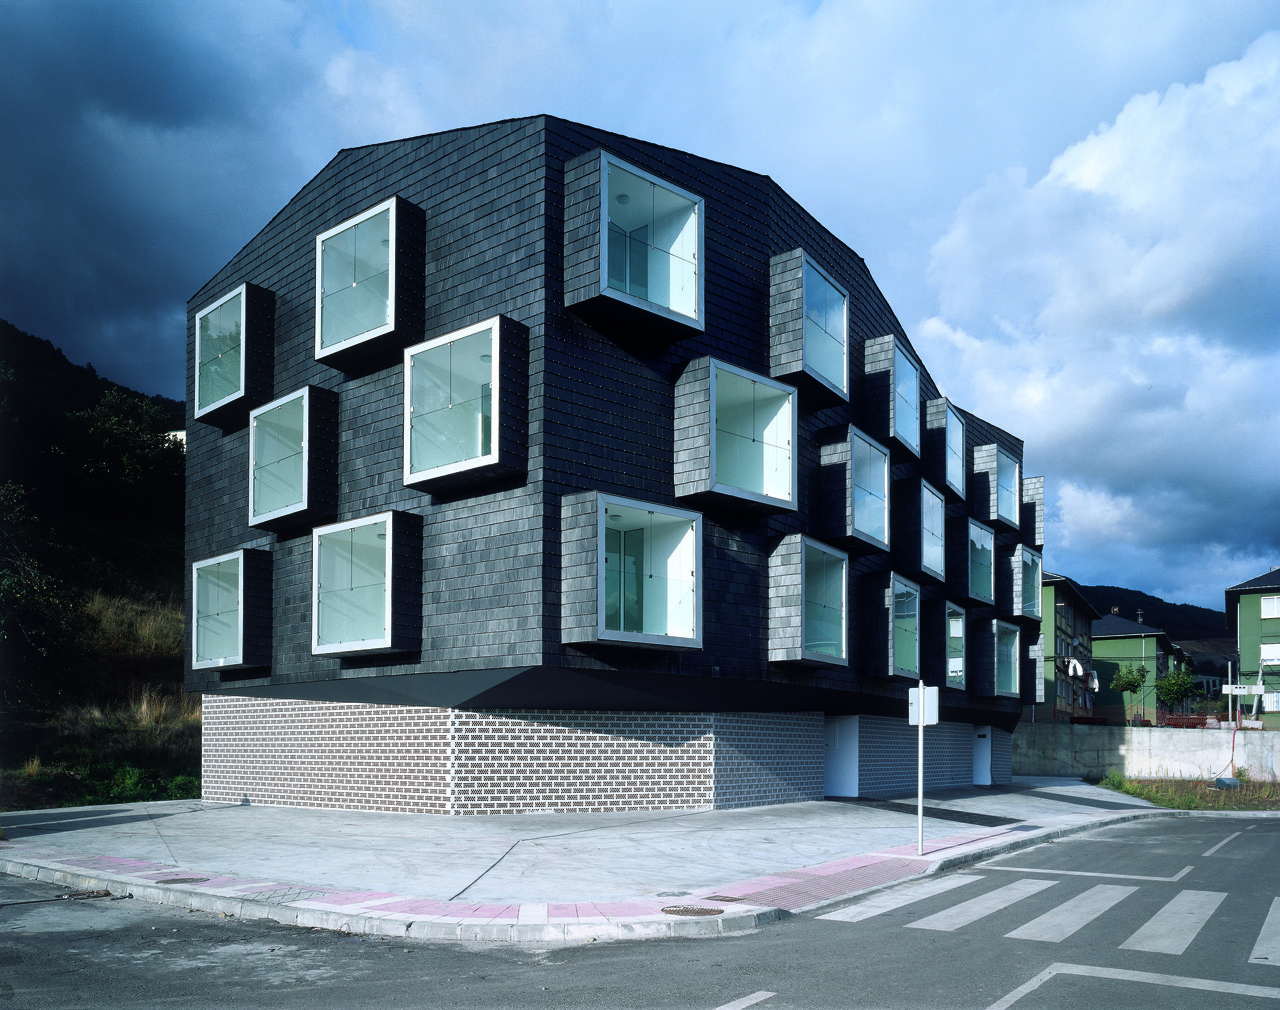 Social Housing for Mine Workers / Zon-e Arquitectos, © Ignacio Martinez and Jose Antonio Ruiz